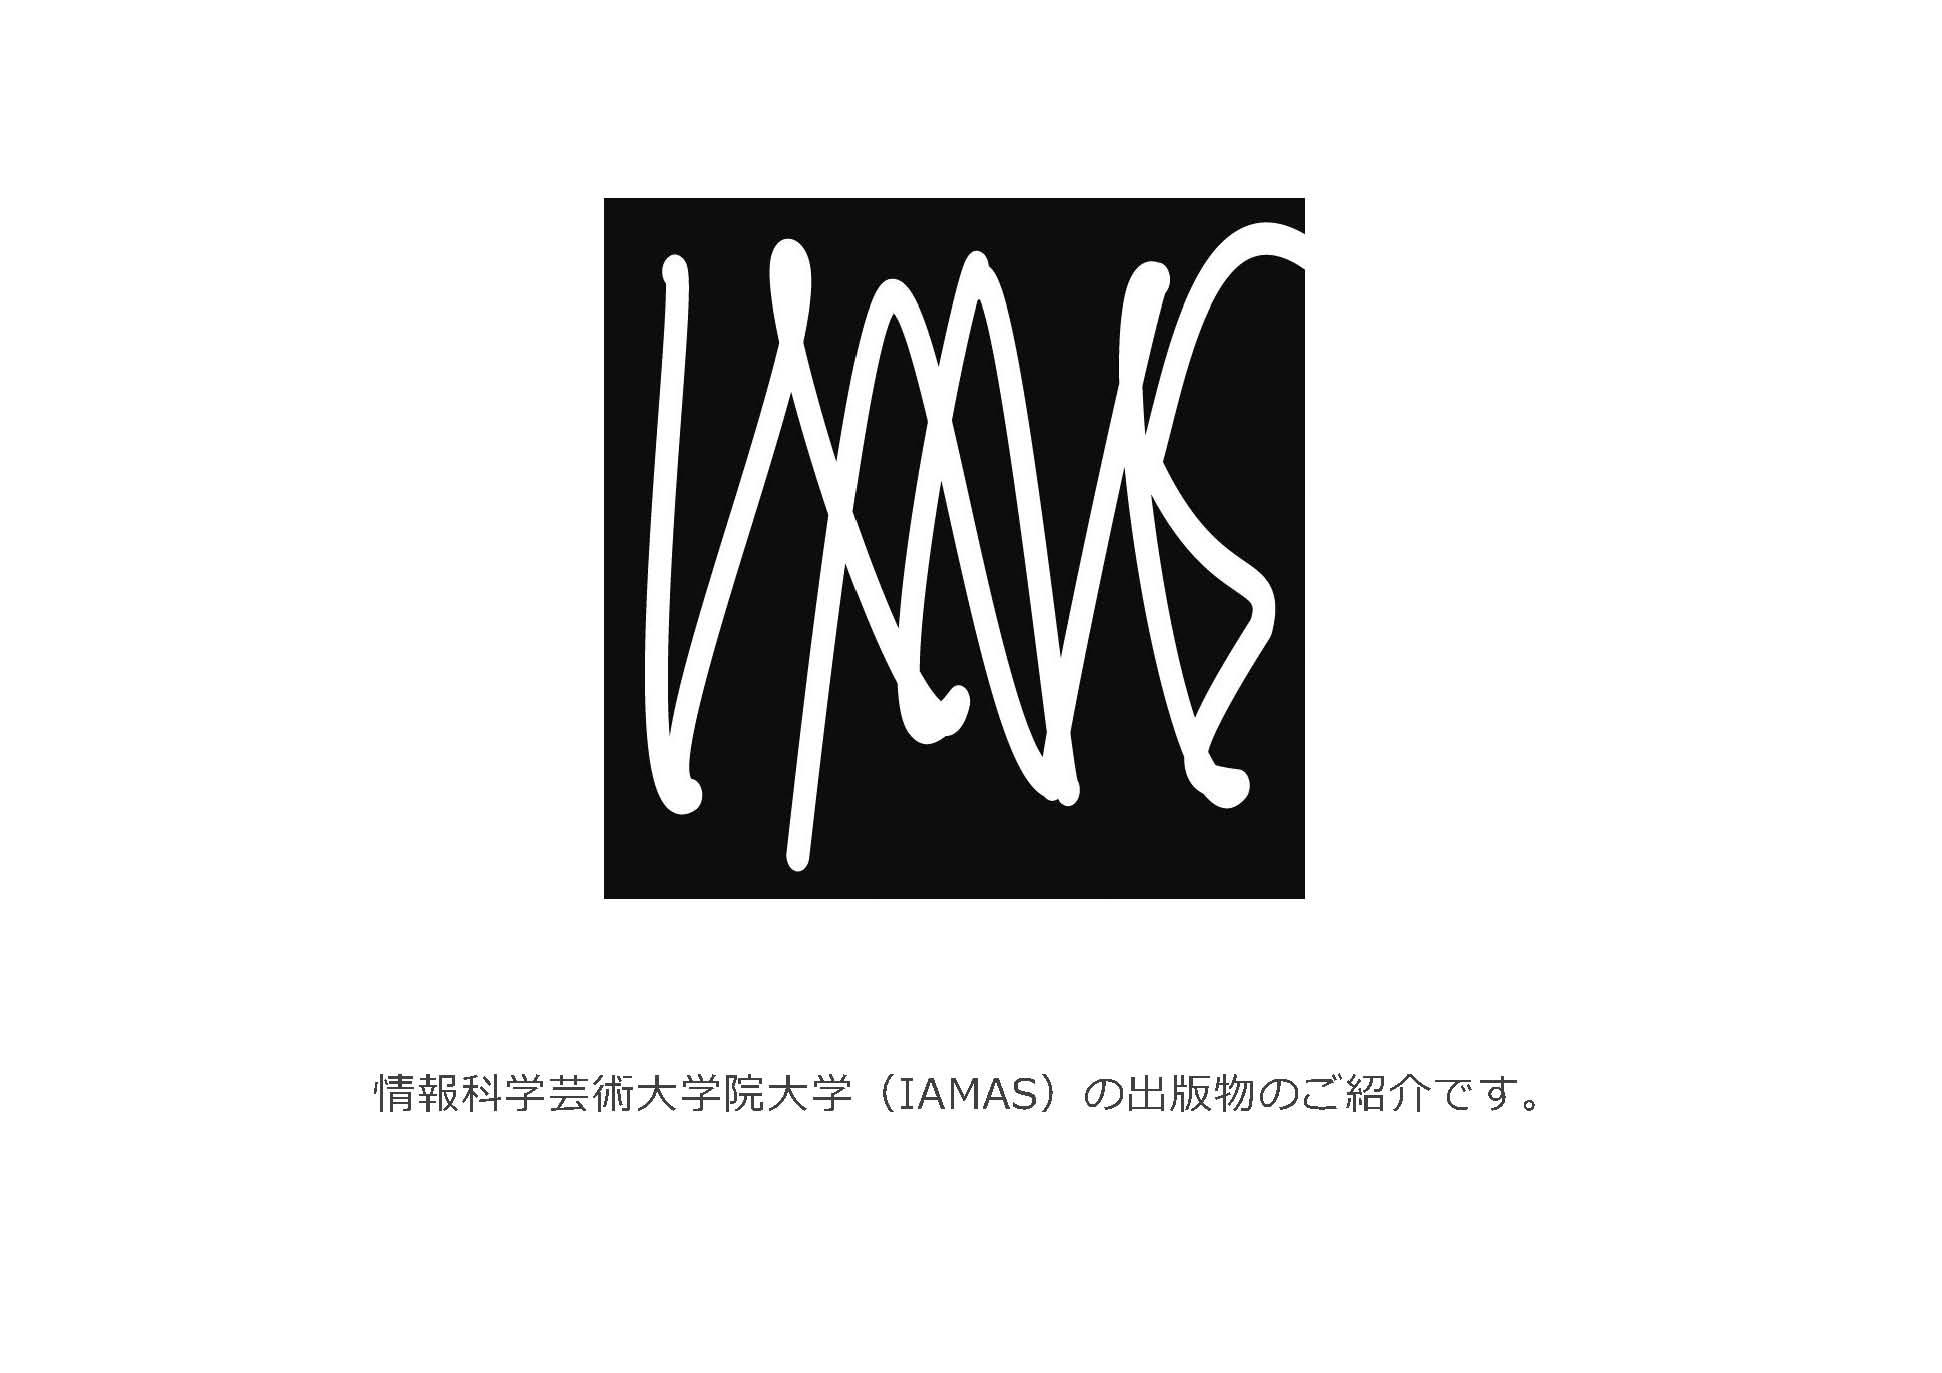 IAMAS刊行物展示